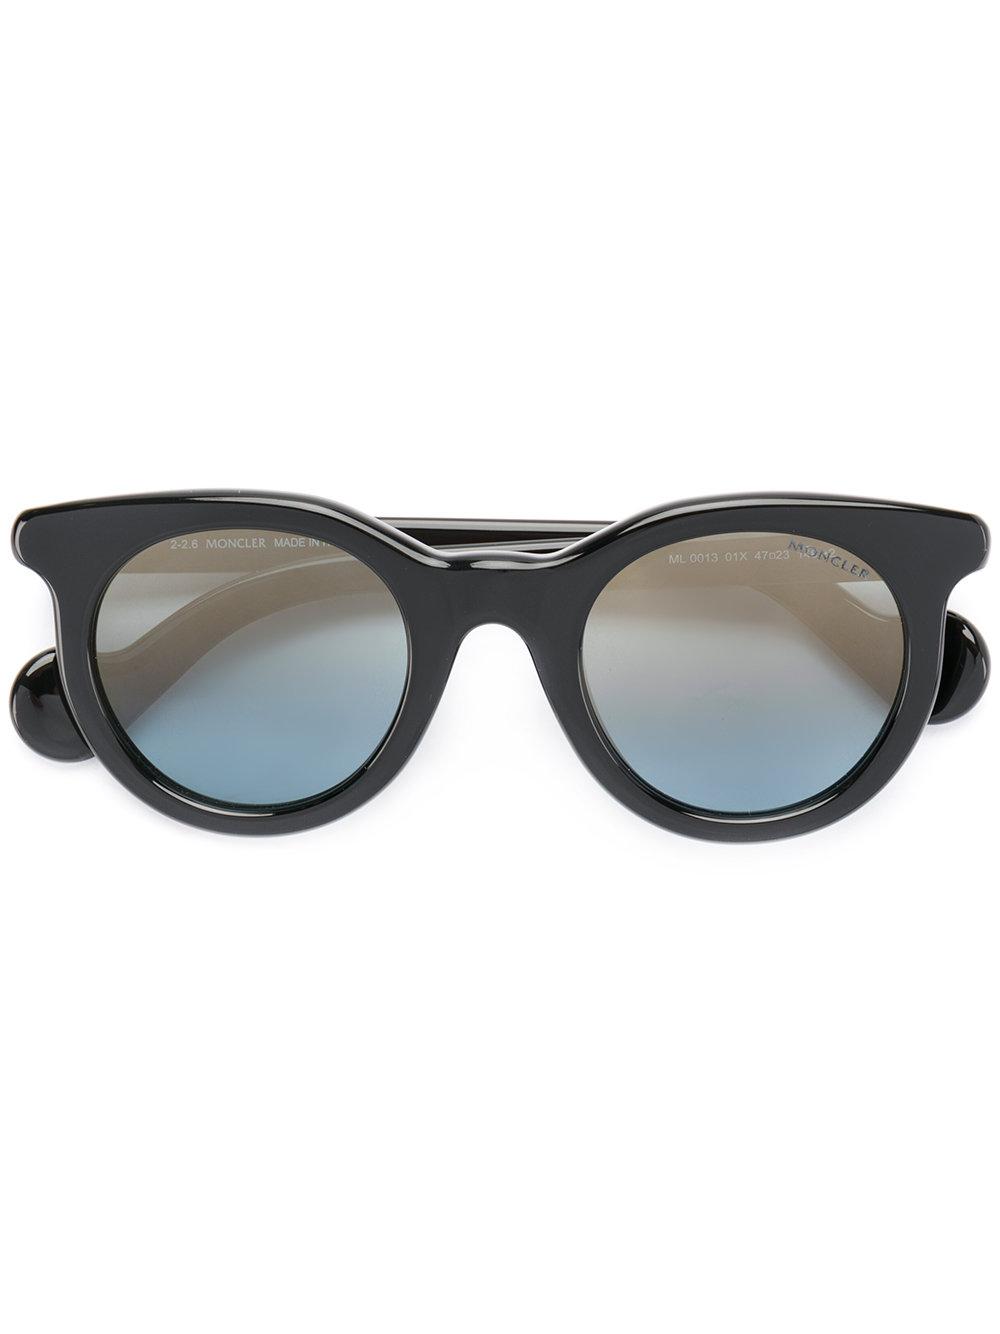 Moncler Eyewear round-frame sunglasses - Black - Glami.hu d875f255fb